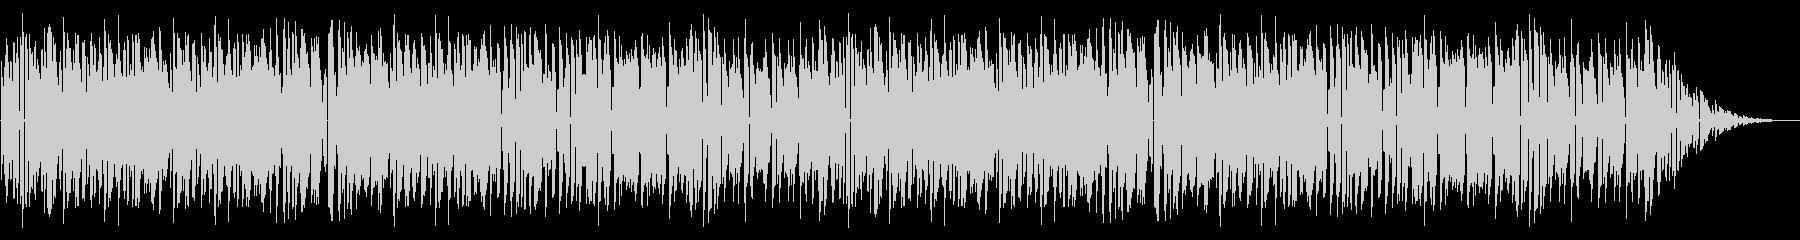 NES アクションD04-1(ステージ3の未再生の波形